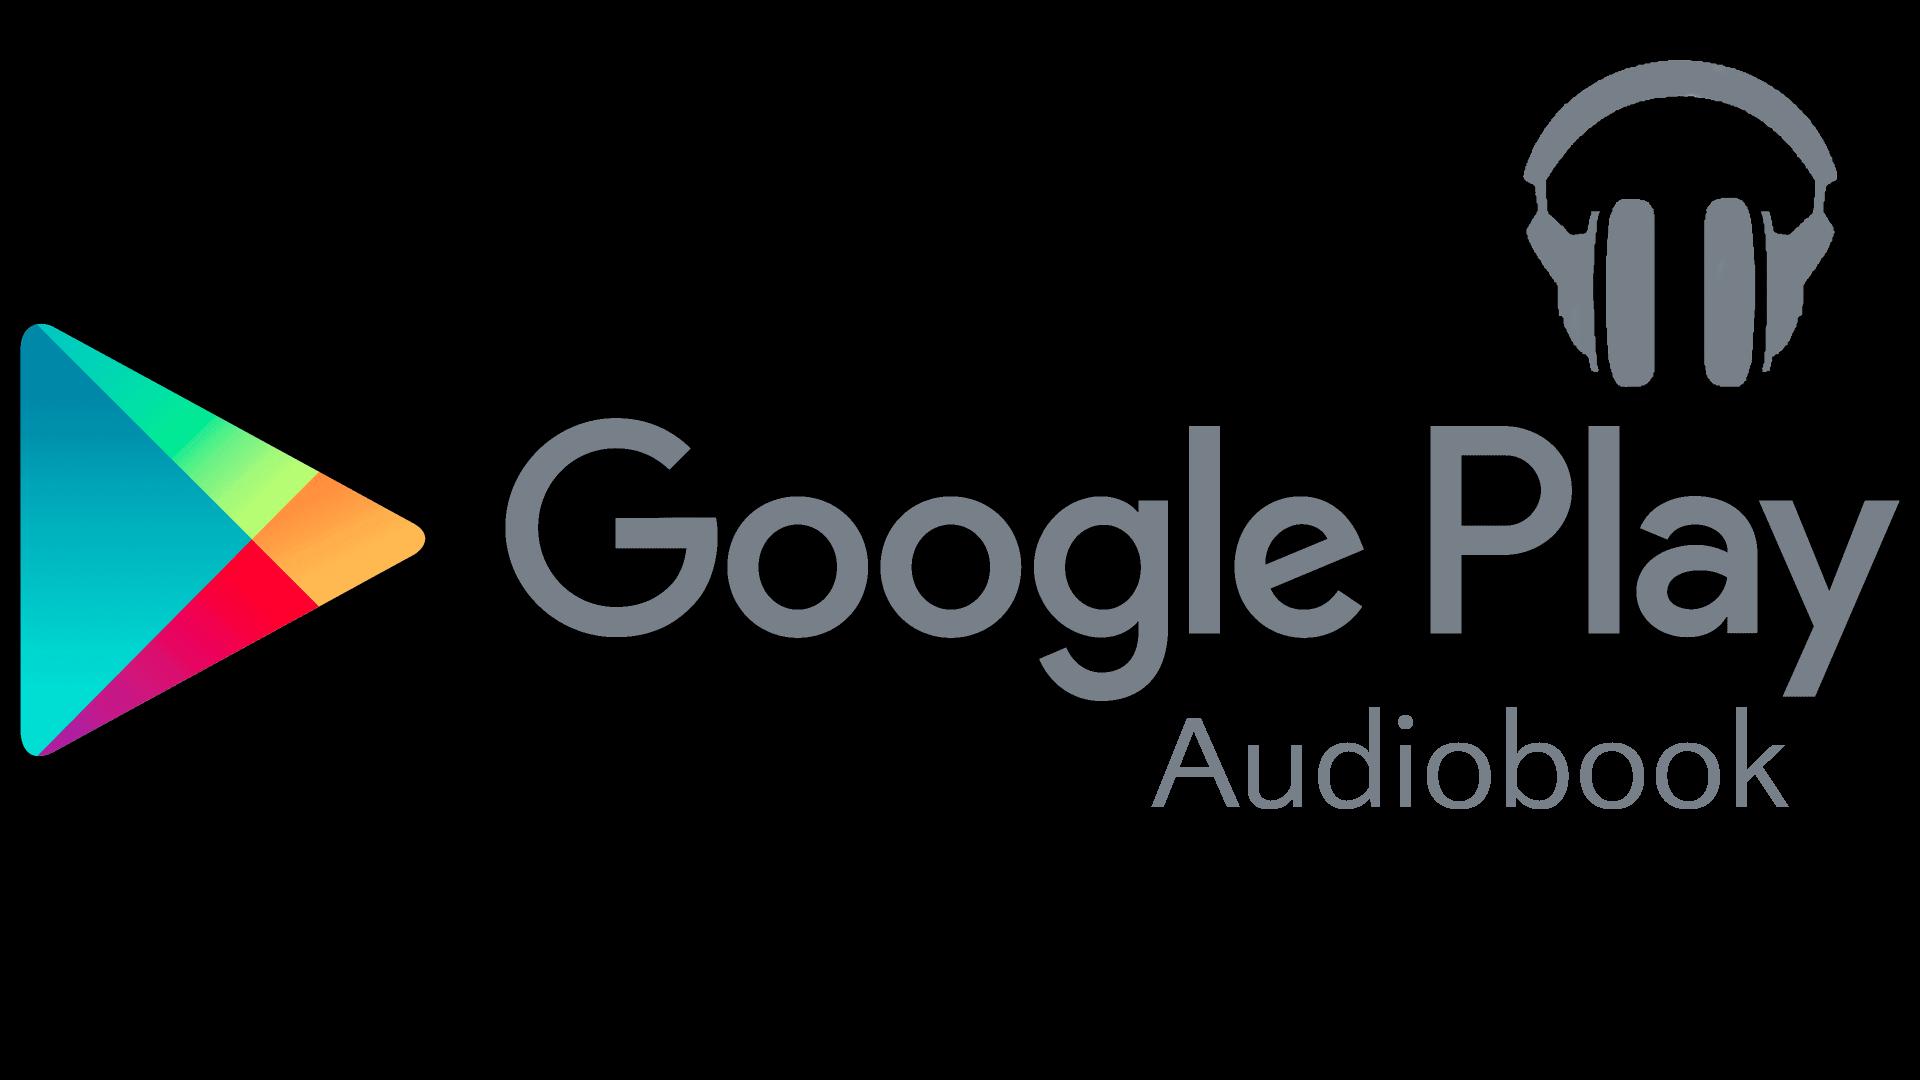 Buy Now: Google play audiobook